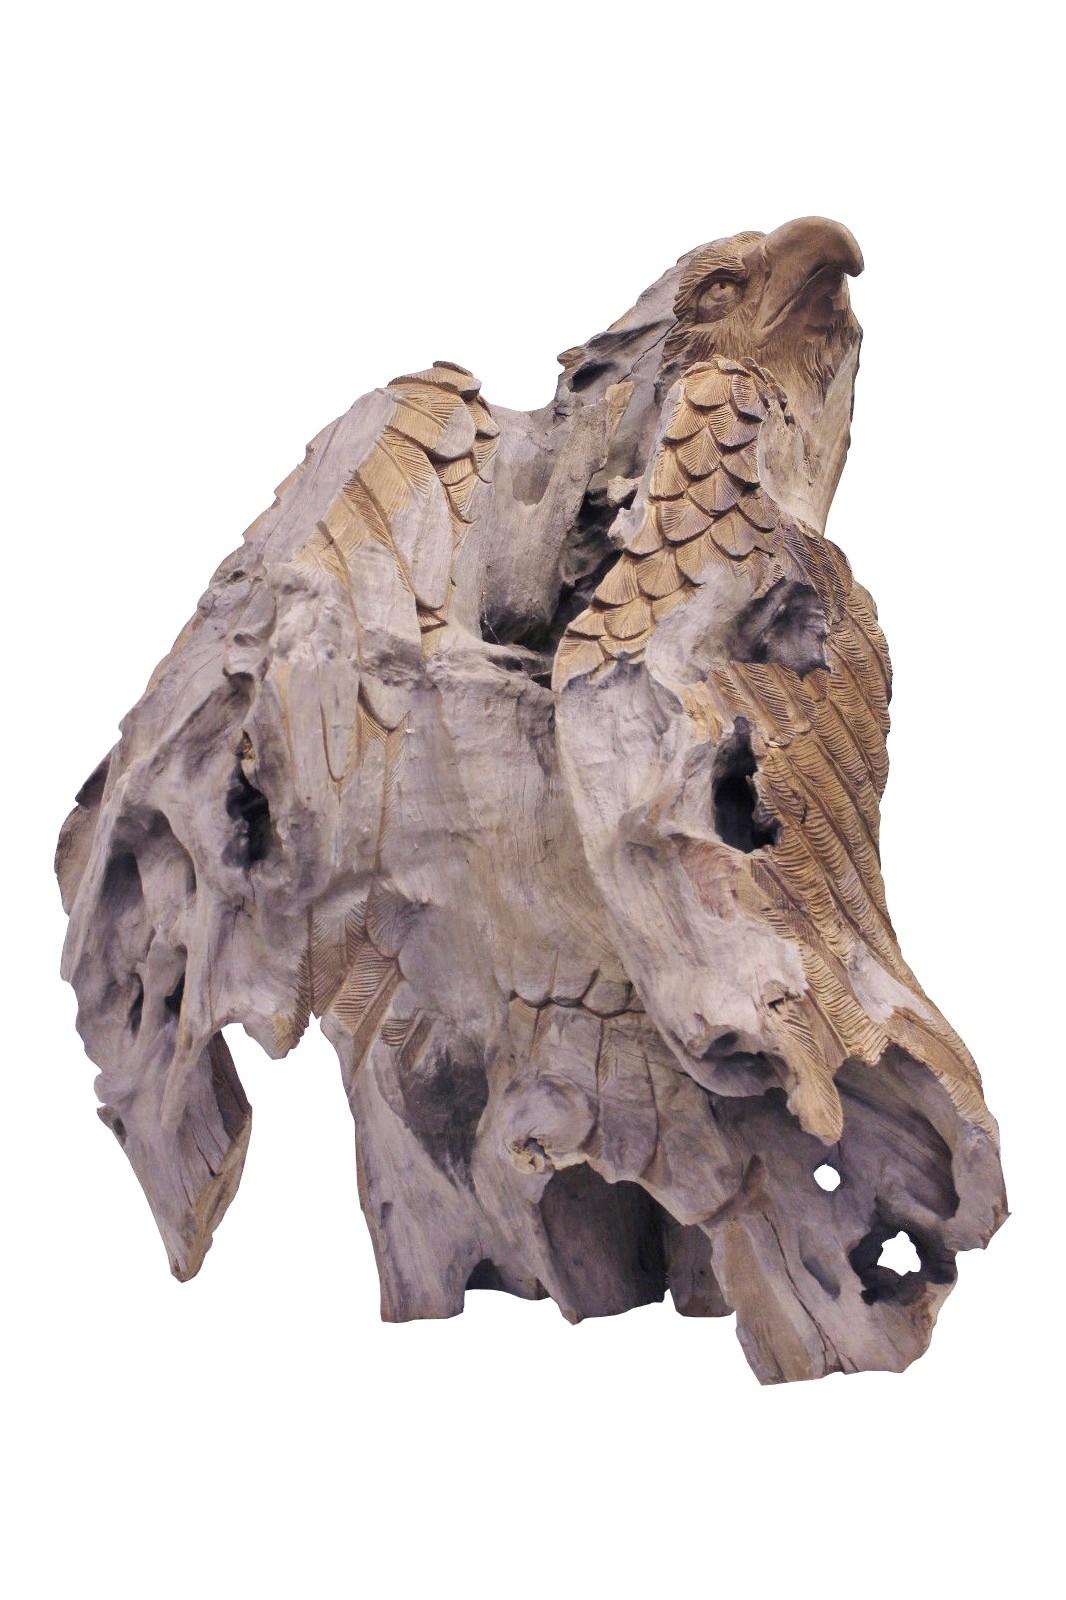 Teak Skulptur Adler gross No1 Wurzelholz